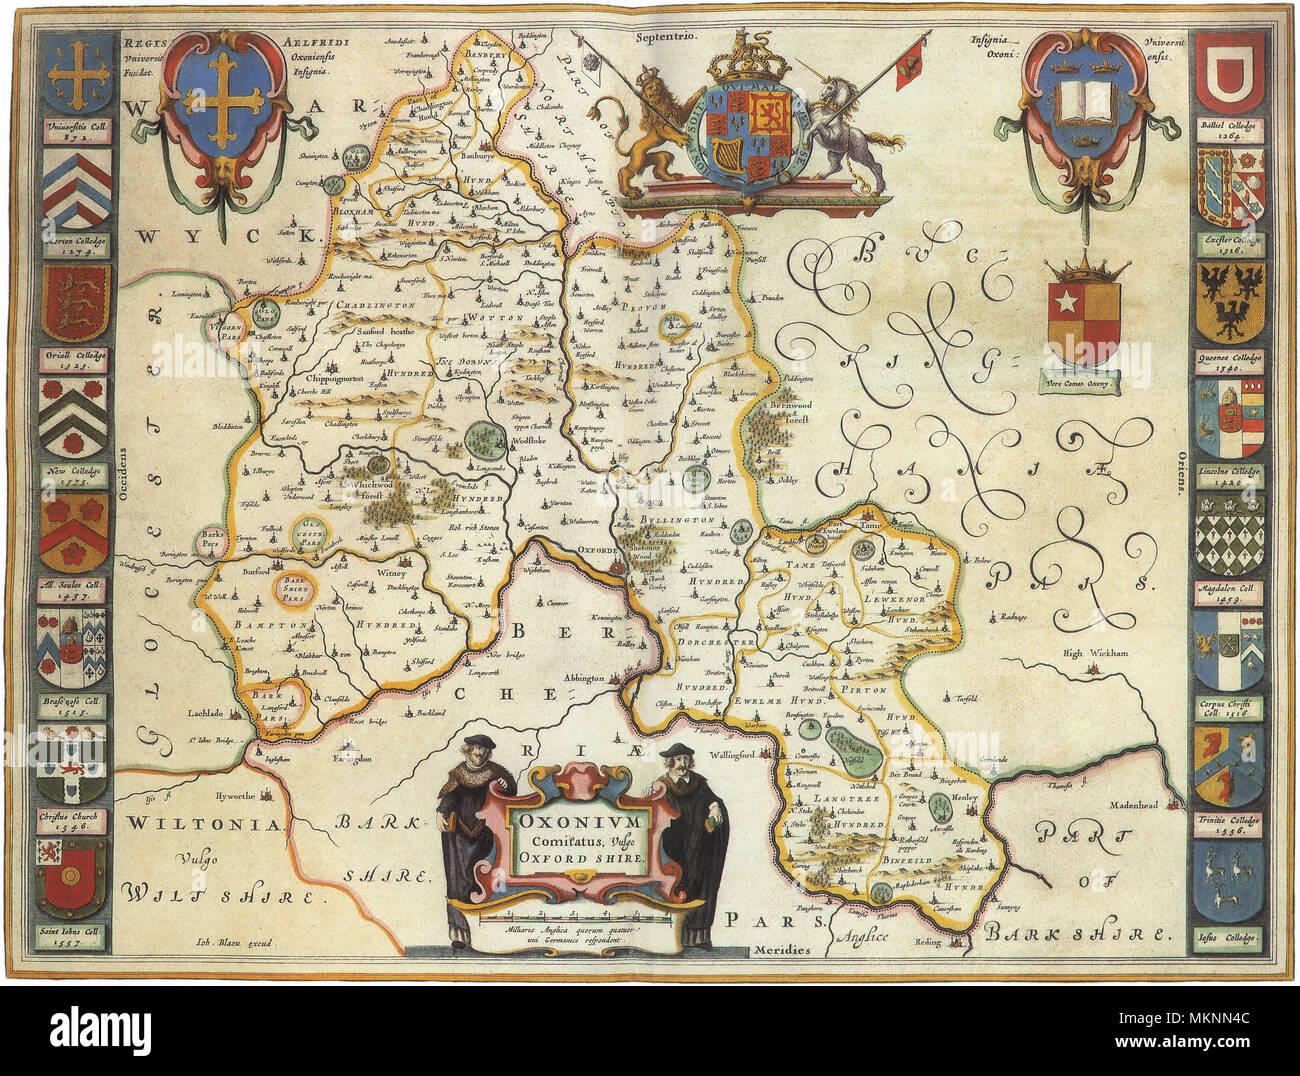 English Counties\' Map 1645 Stock Photo: 184259724 - Alamy